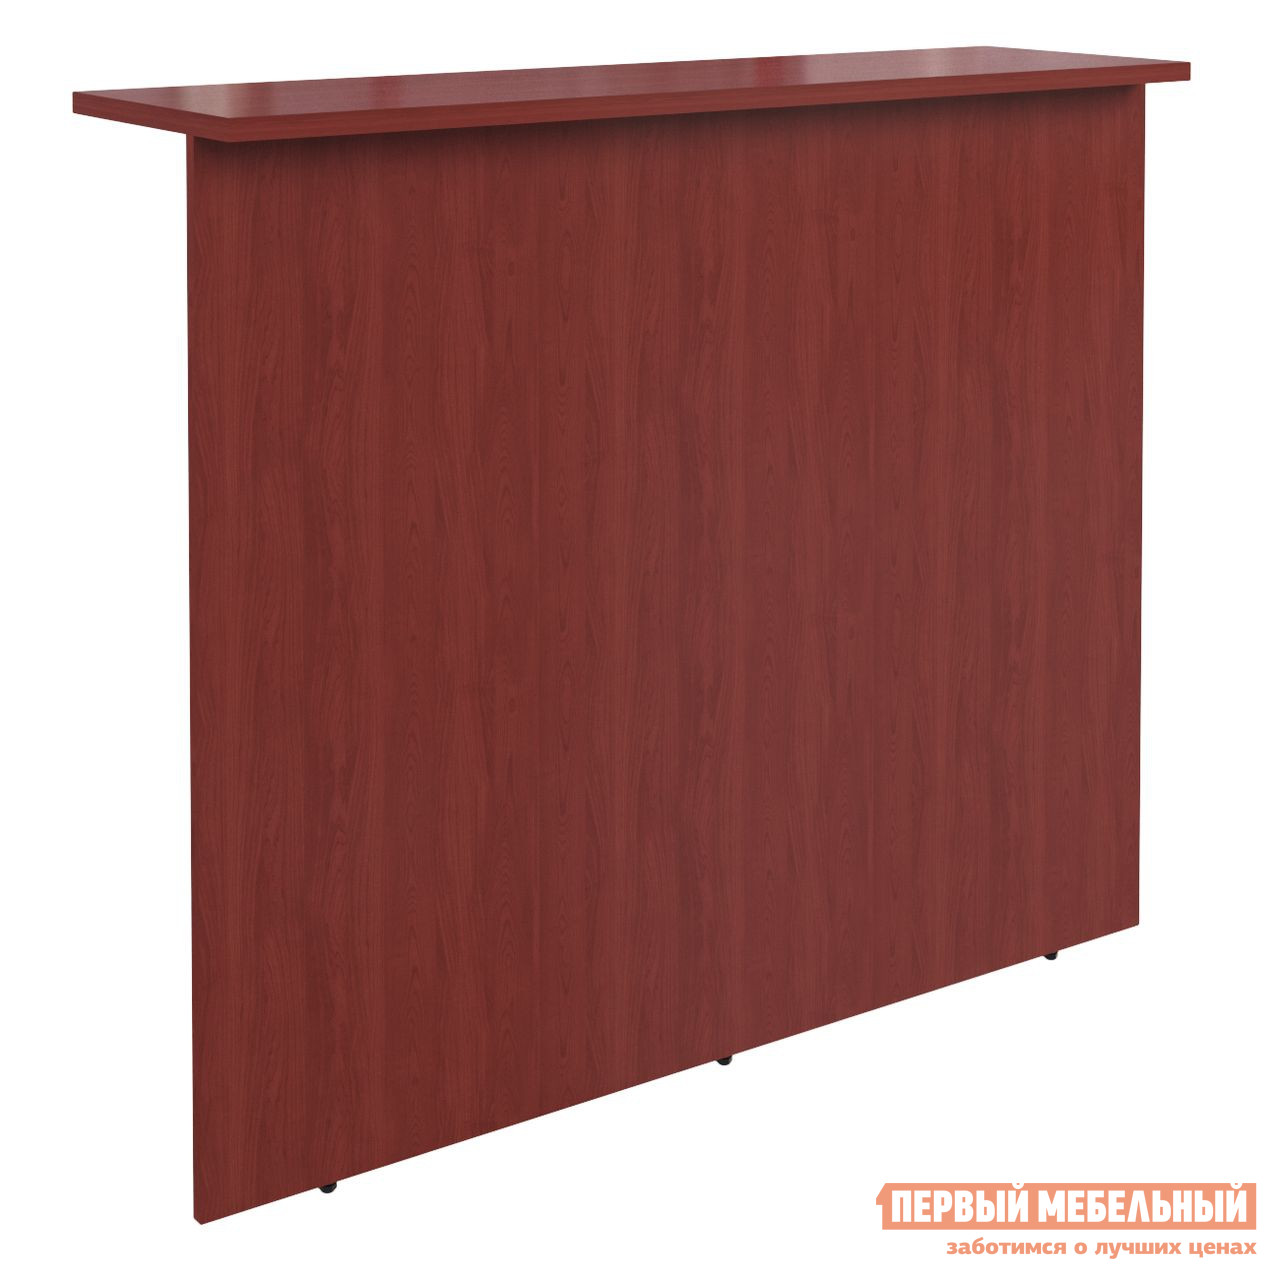 Стойка ресепшн Тайпит DMS 160 ресепшн hongsheng furniture